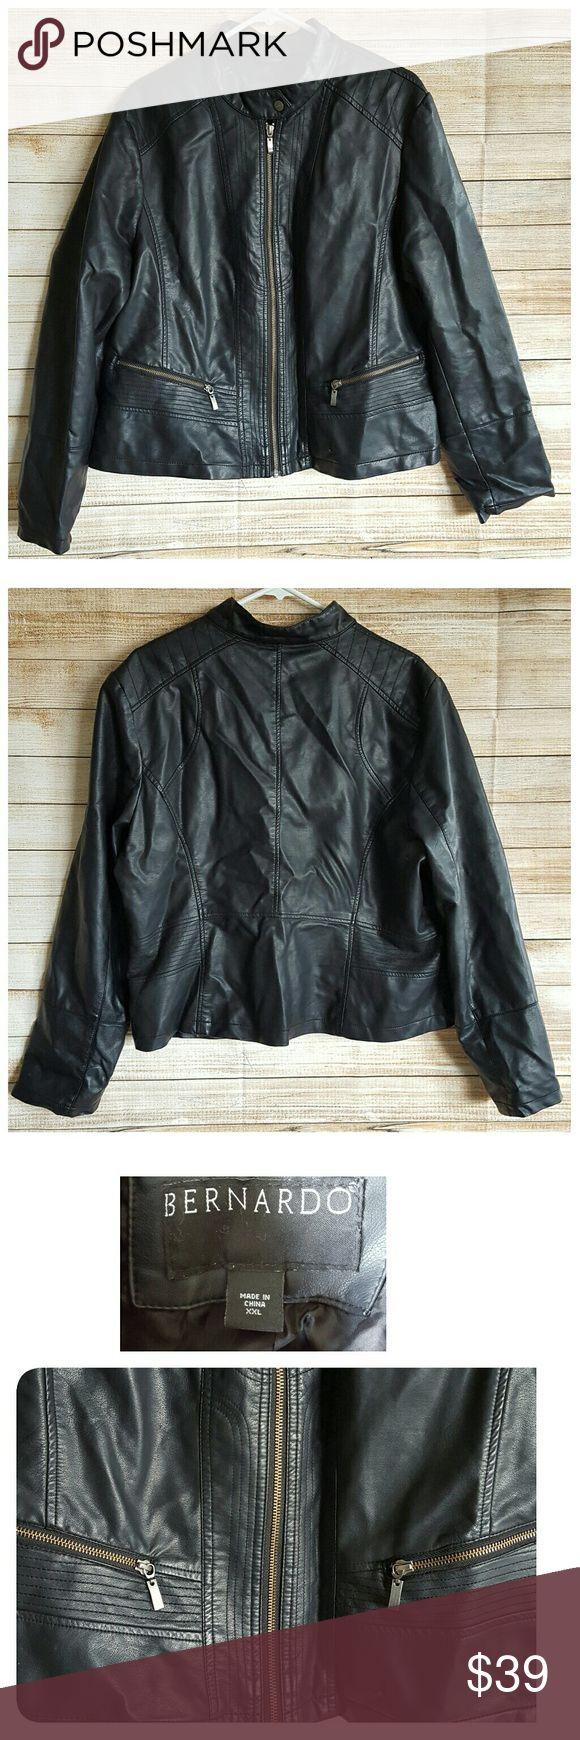 Bernardo black faux leather jacket vegan bomber 2X Beautiful condition with no flaws Bernardo Jackets & Coats